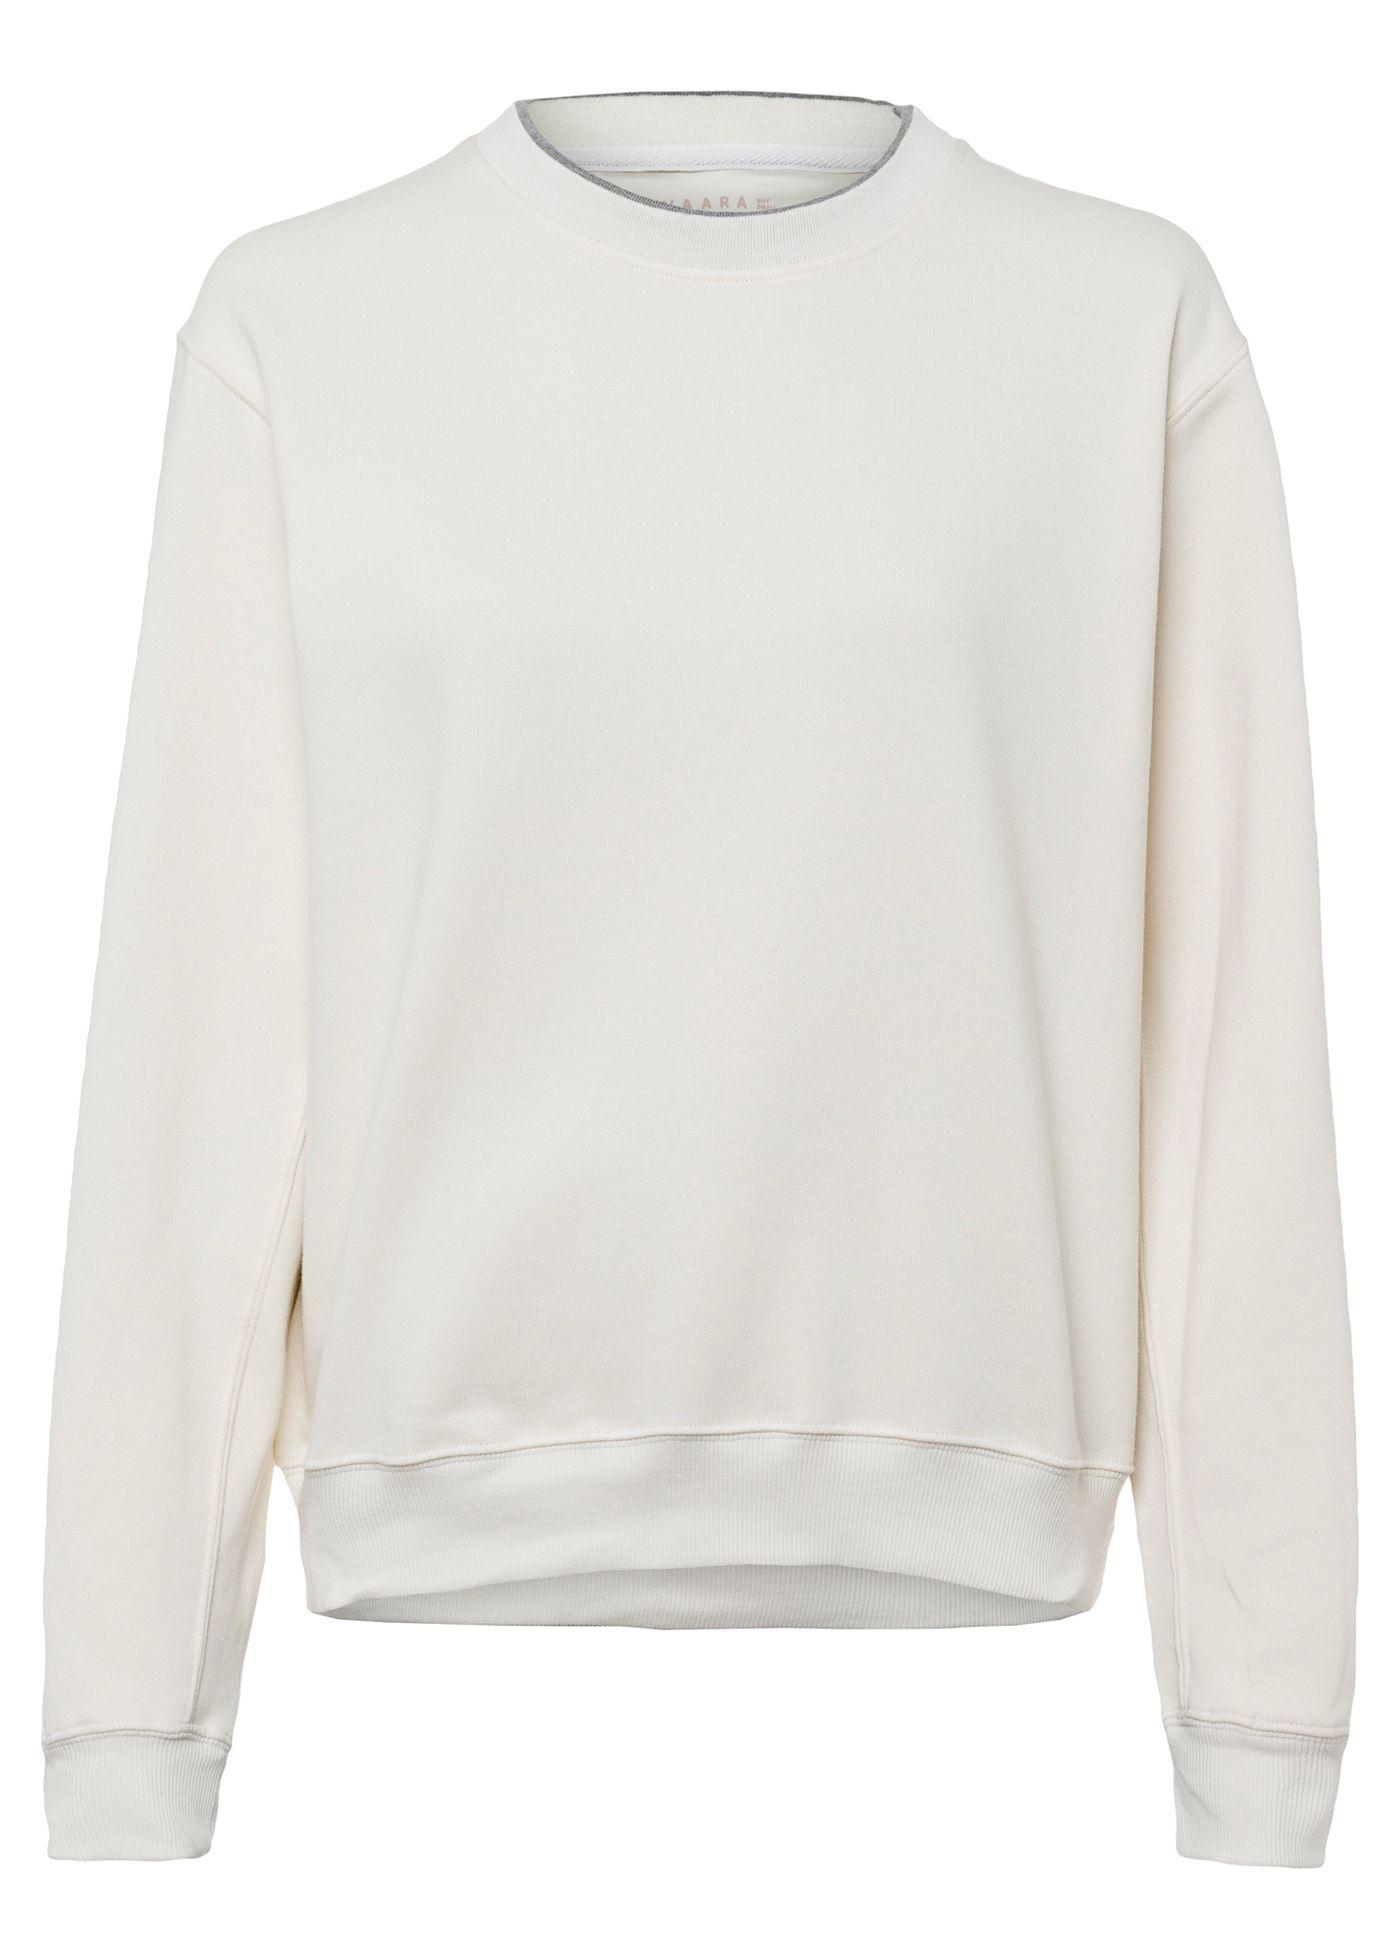 May Organic Sweatshirt image number 0